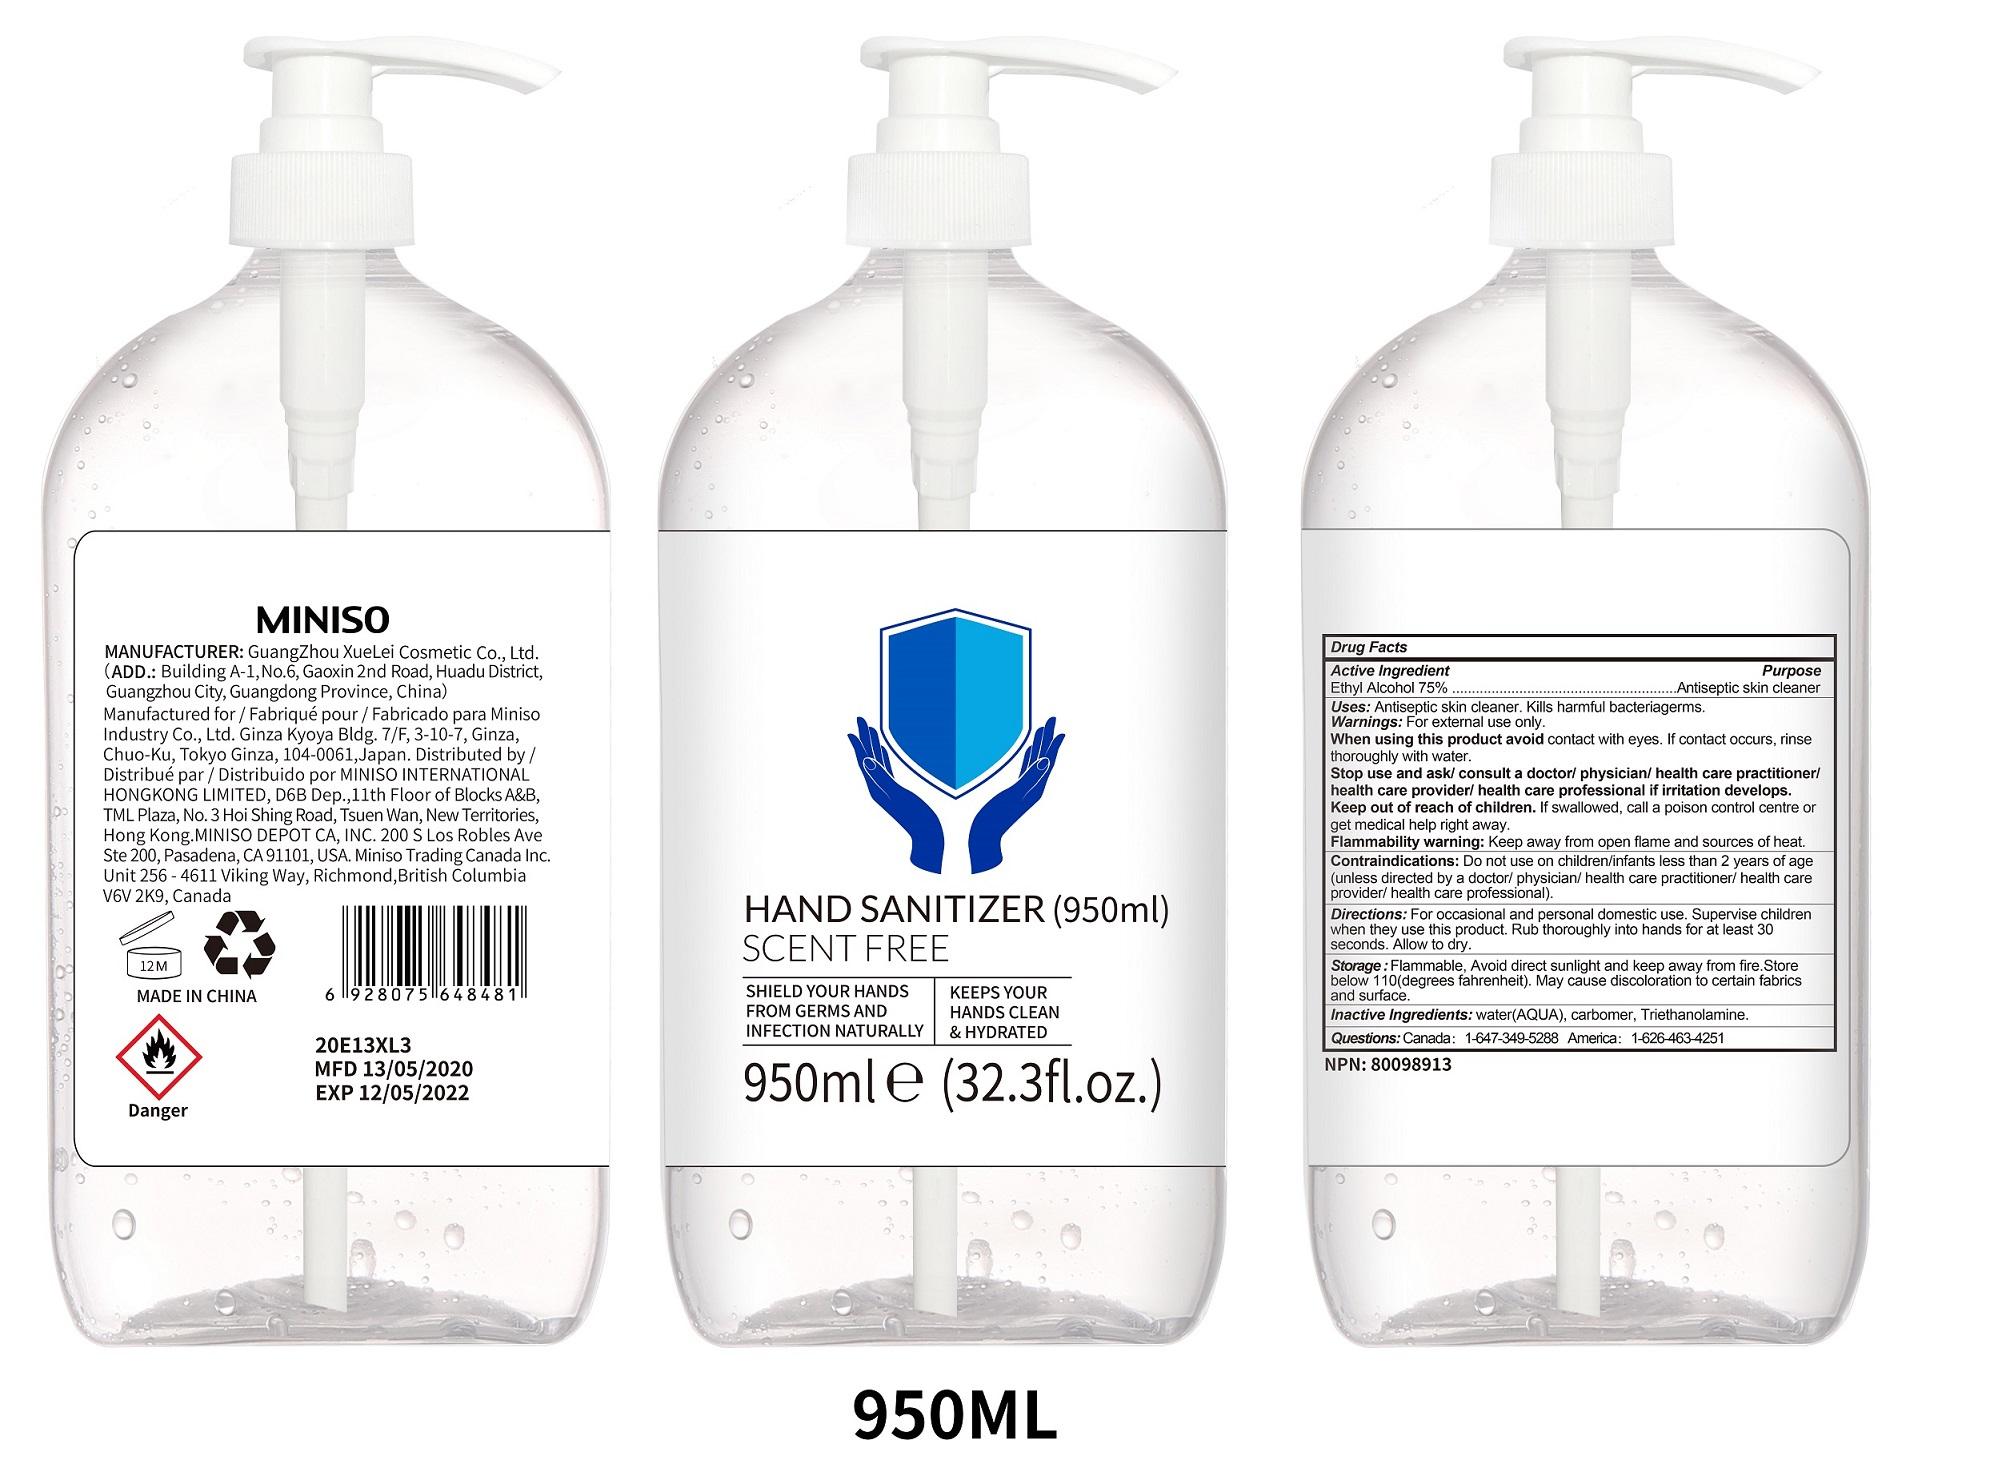 950ml label